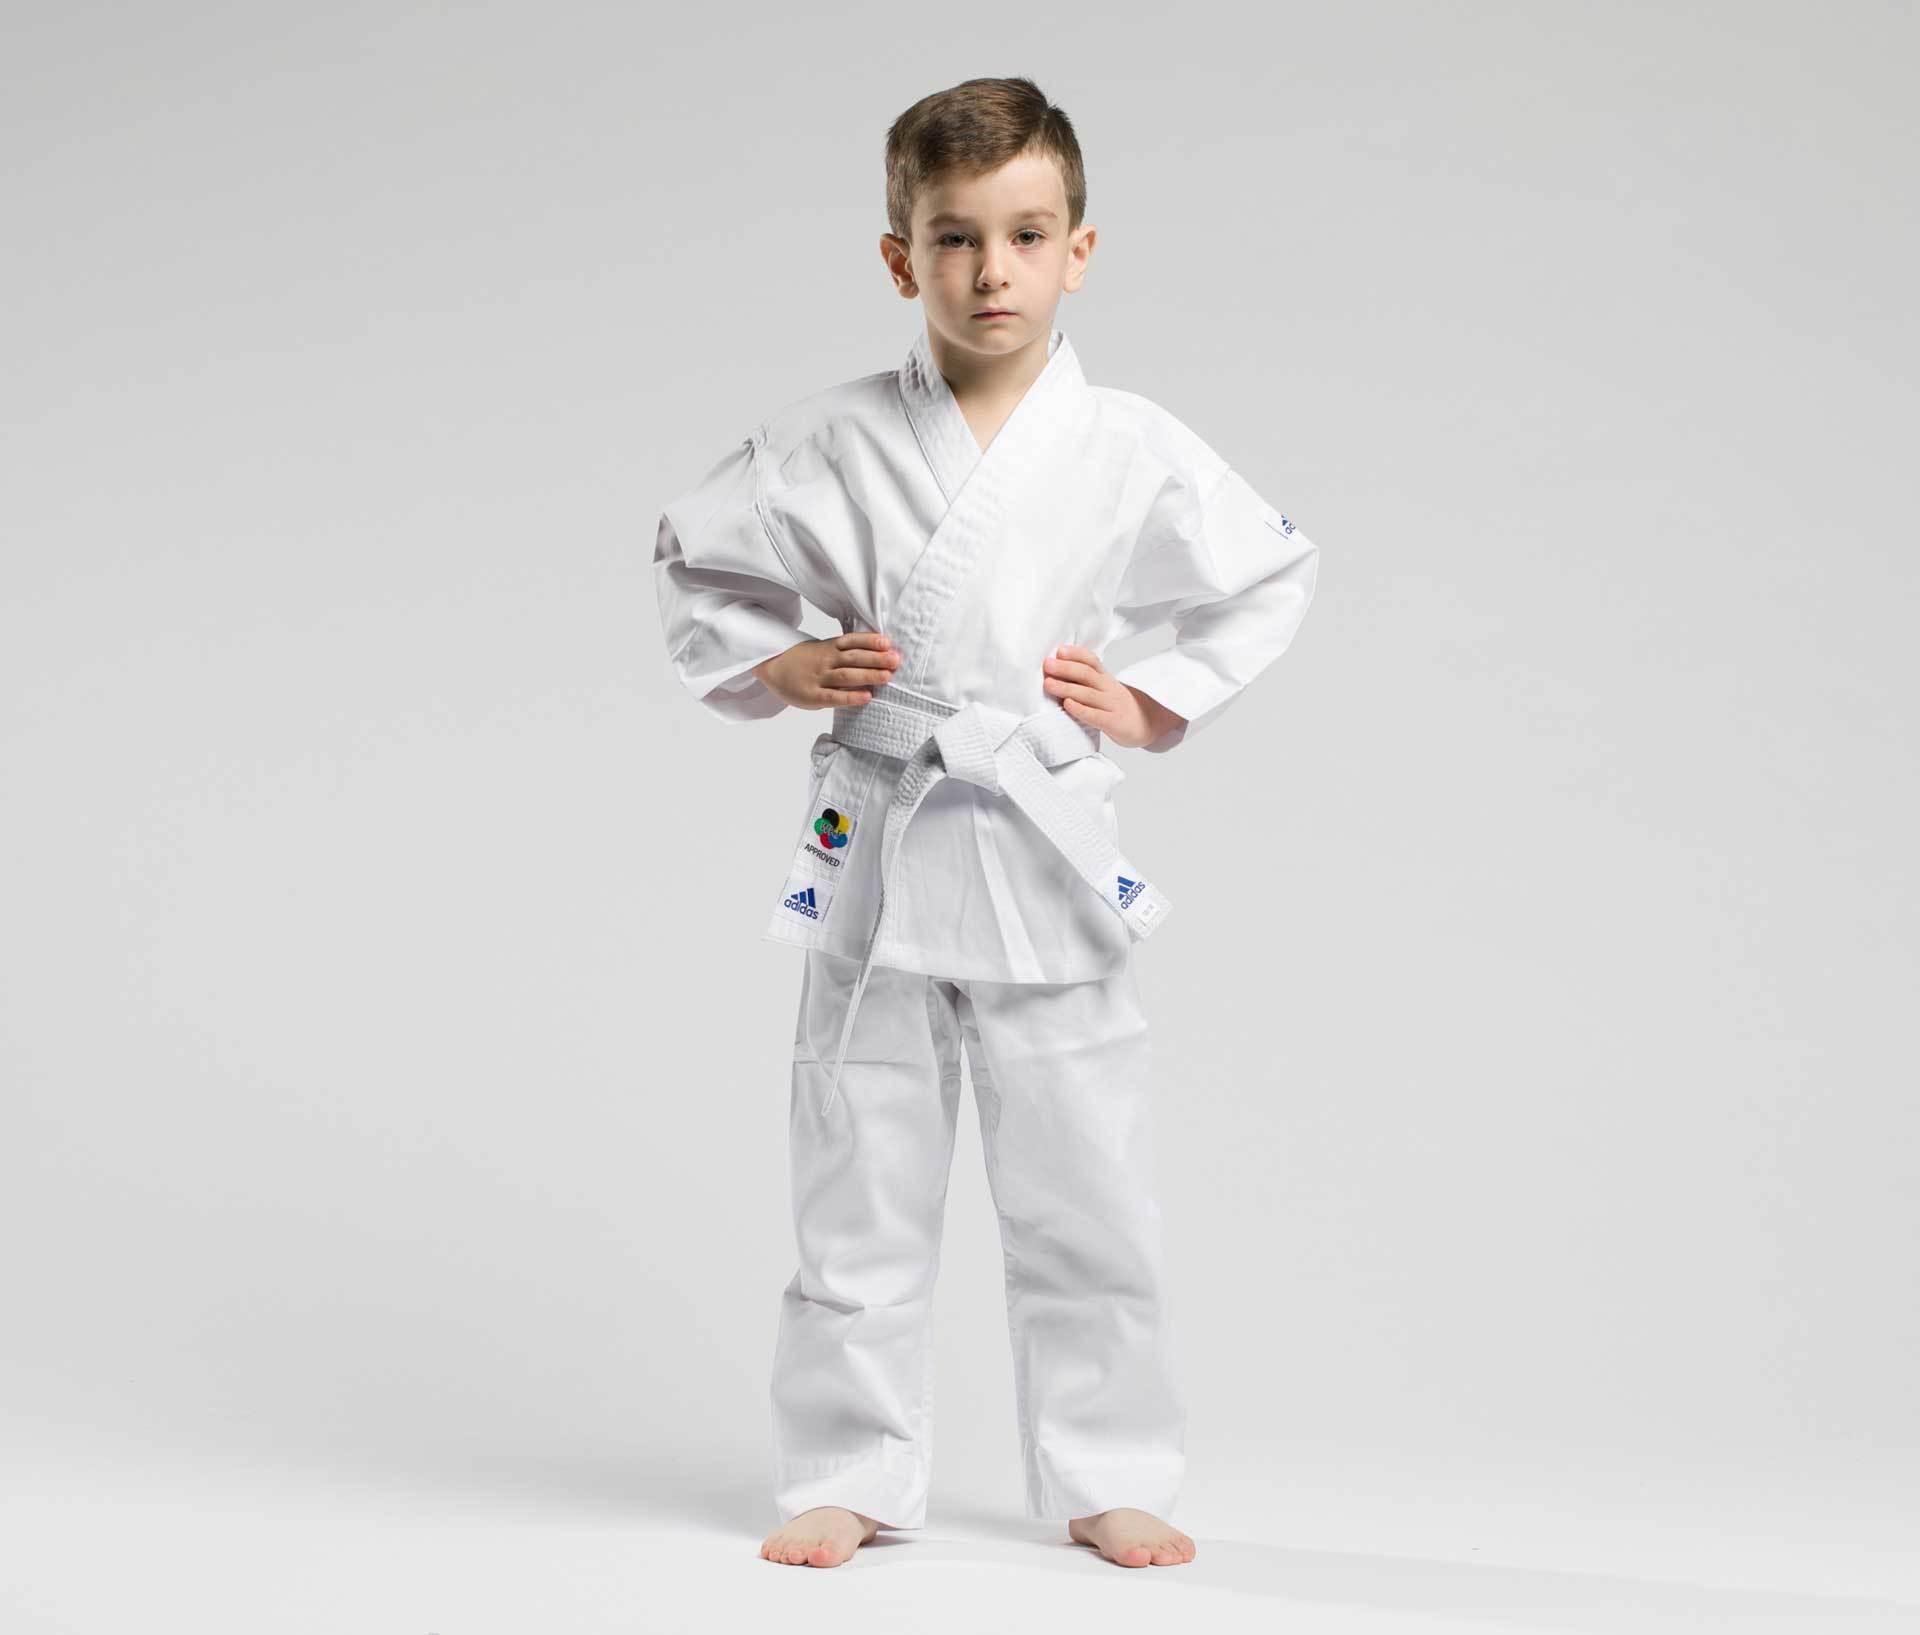 Кимоно КИМОНО ДЛЯ КАРАТЕ ДЕТСКОЕ С ПОЯСОМ KIDS WKF ADIDAS kimono_dlya_karate_podrostkovoe_s_poyasom_kids_wkf_beloe.jpg